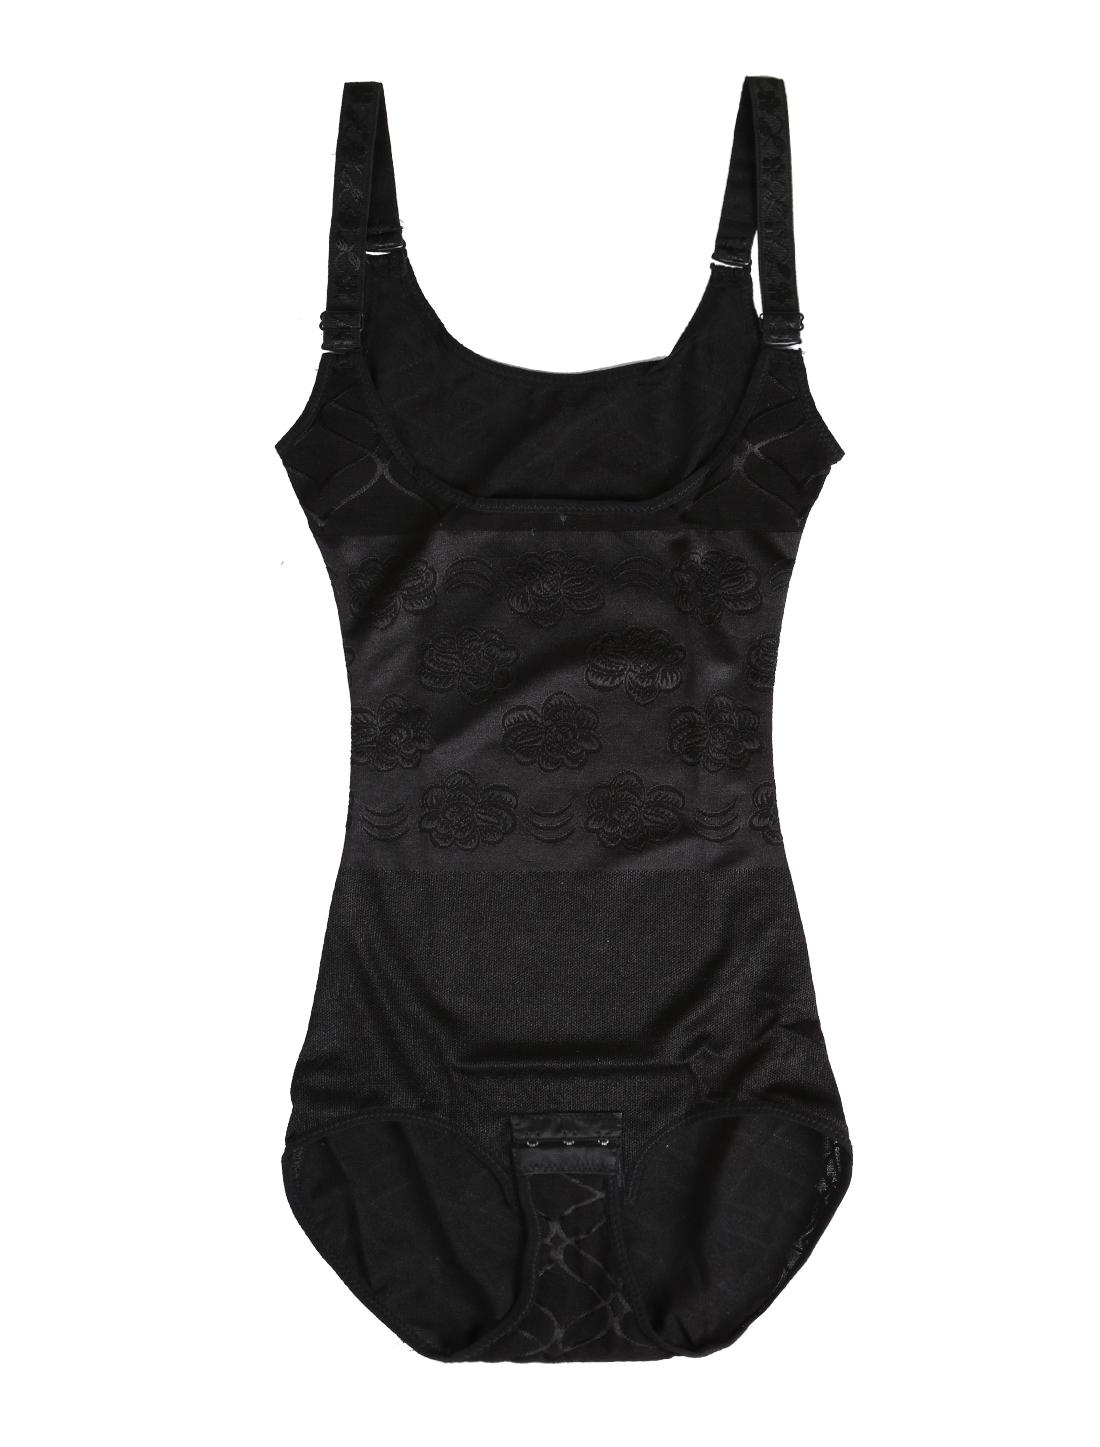 Women Seamless Front U-Style Open Bust Firm Control Shapewear Black Large